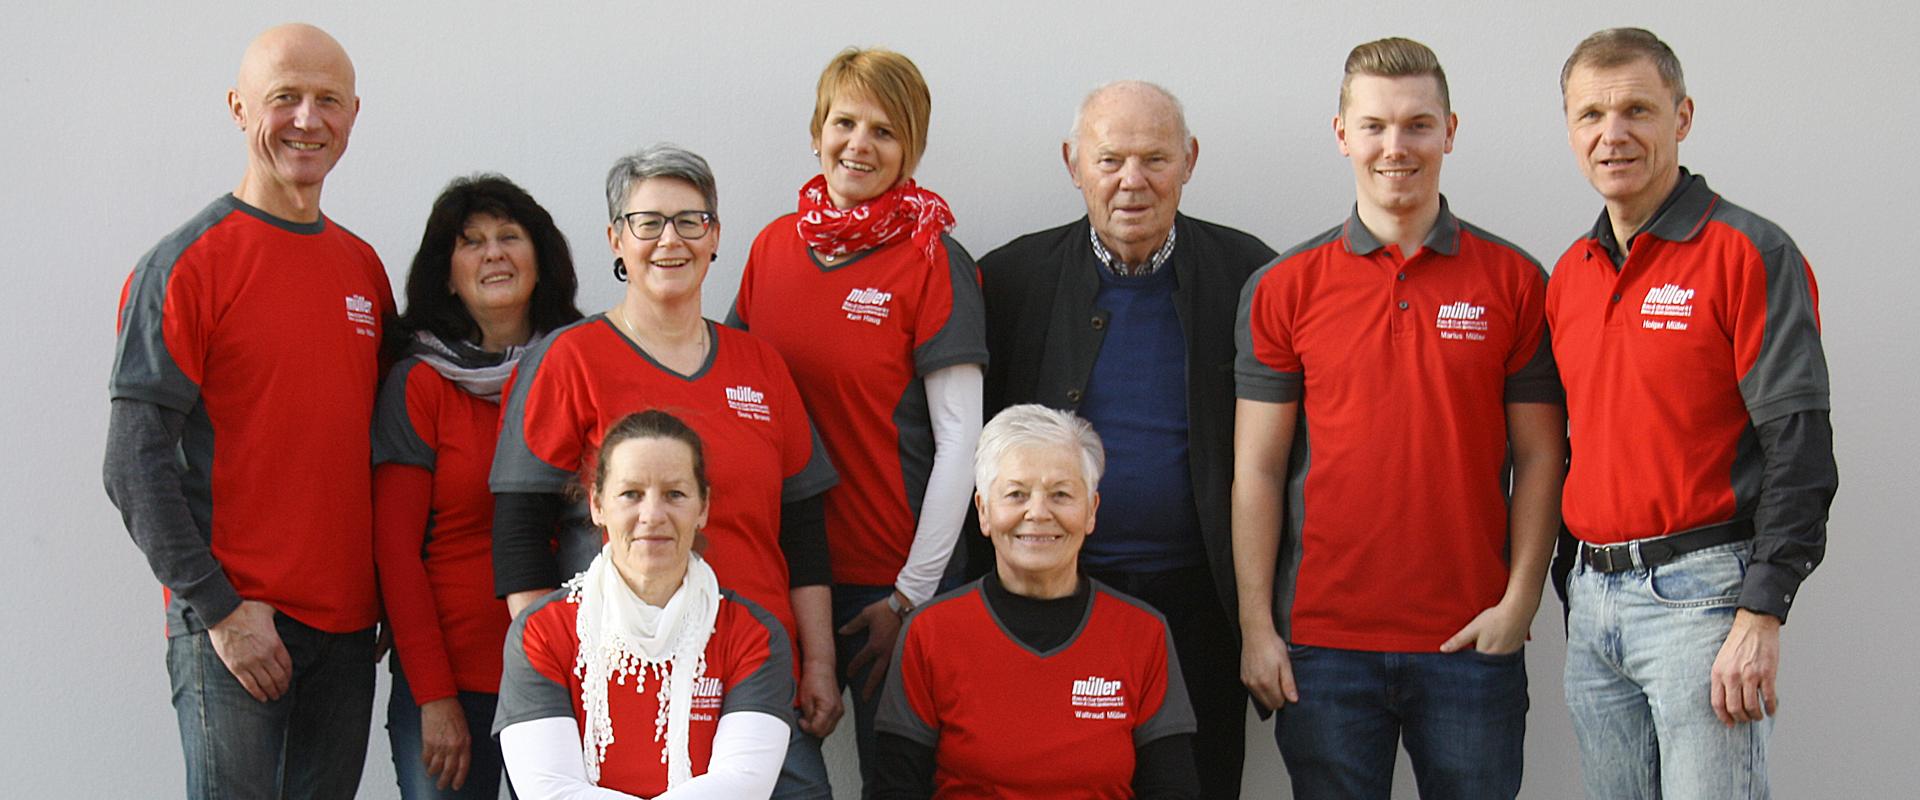 Team Neckartailfingen